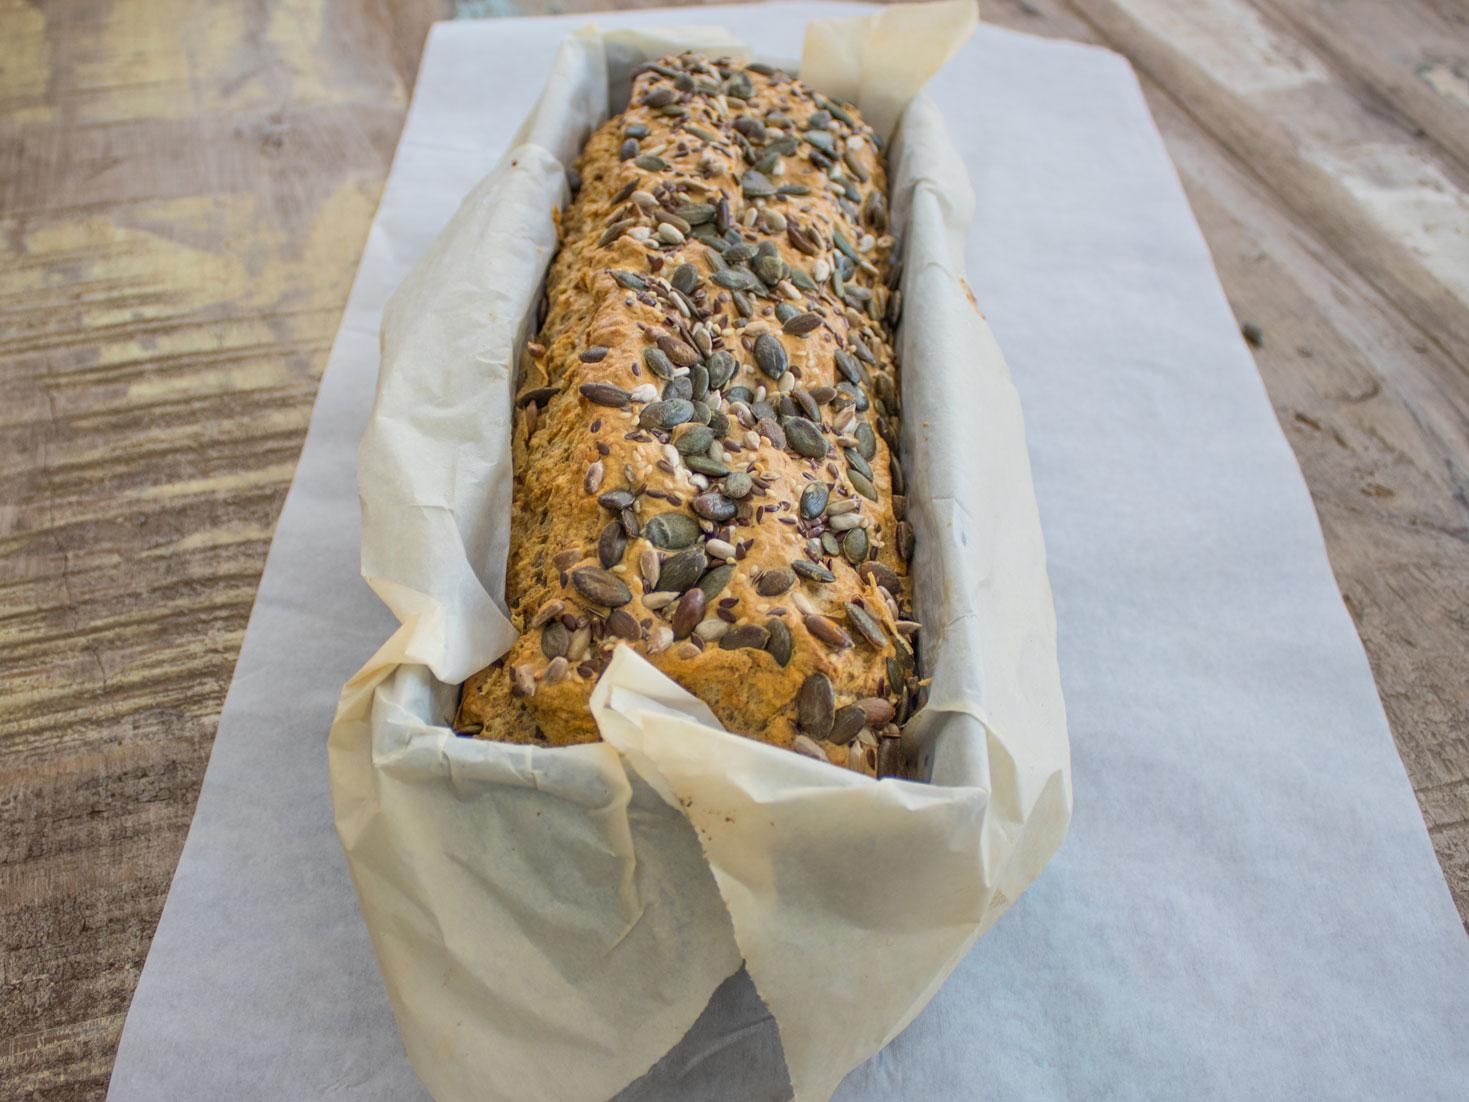 bread tin with bread dough rising